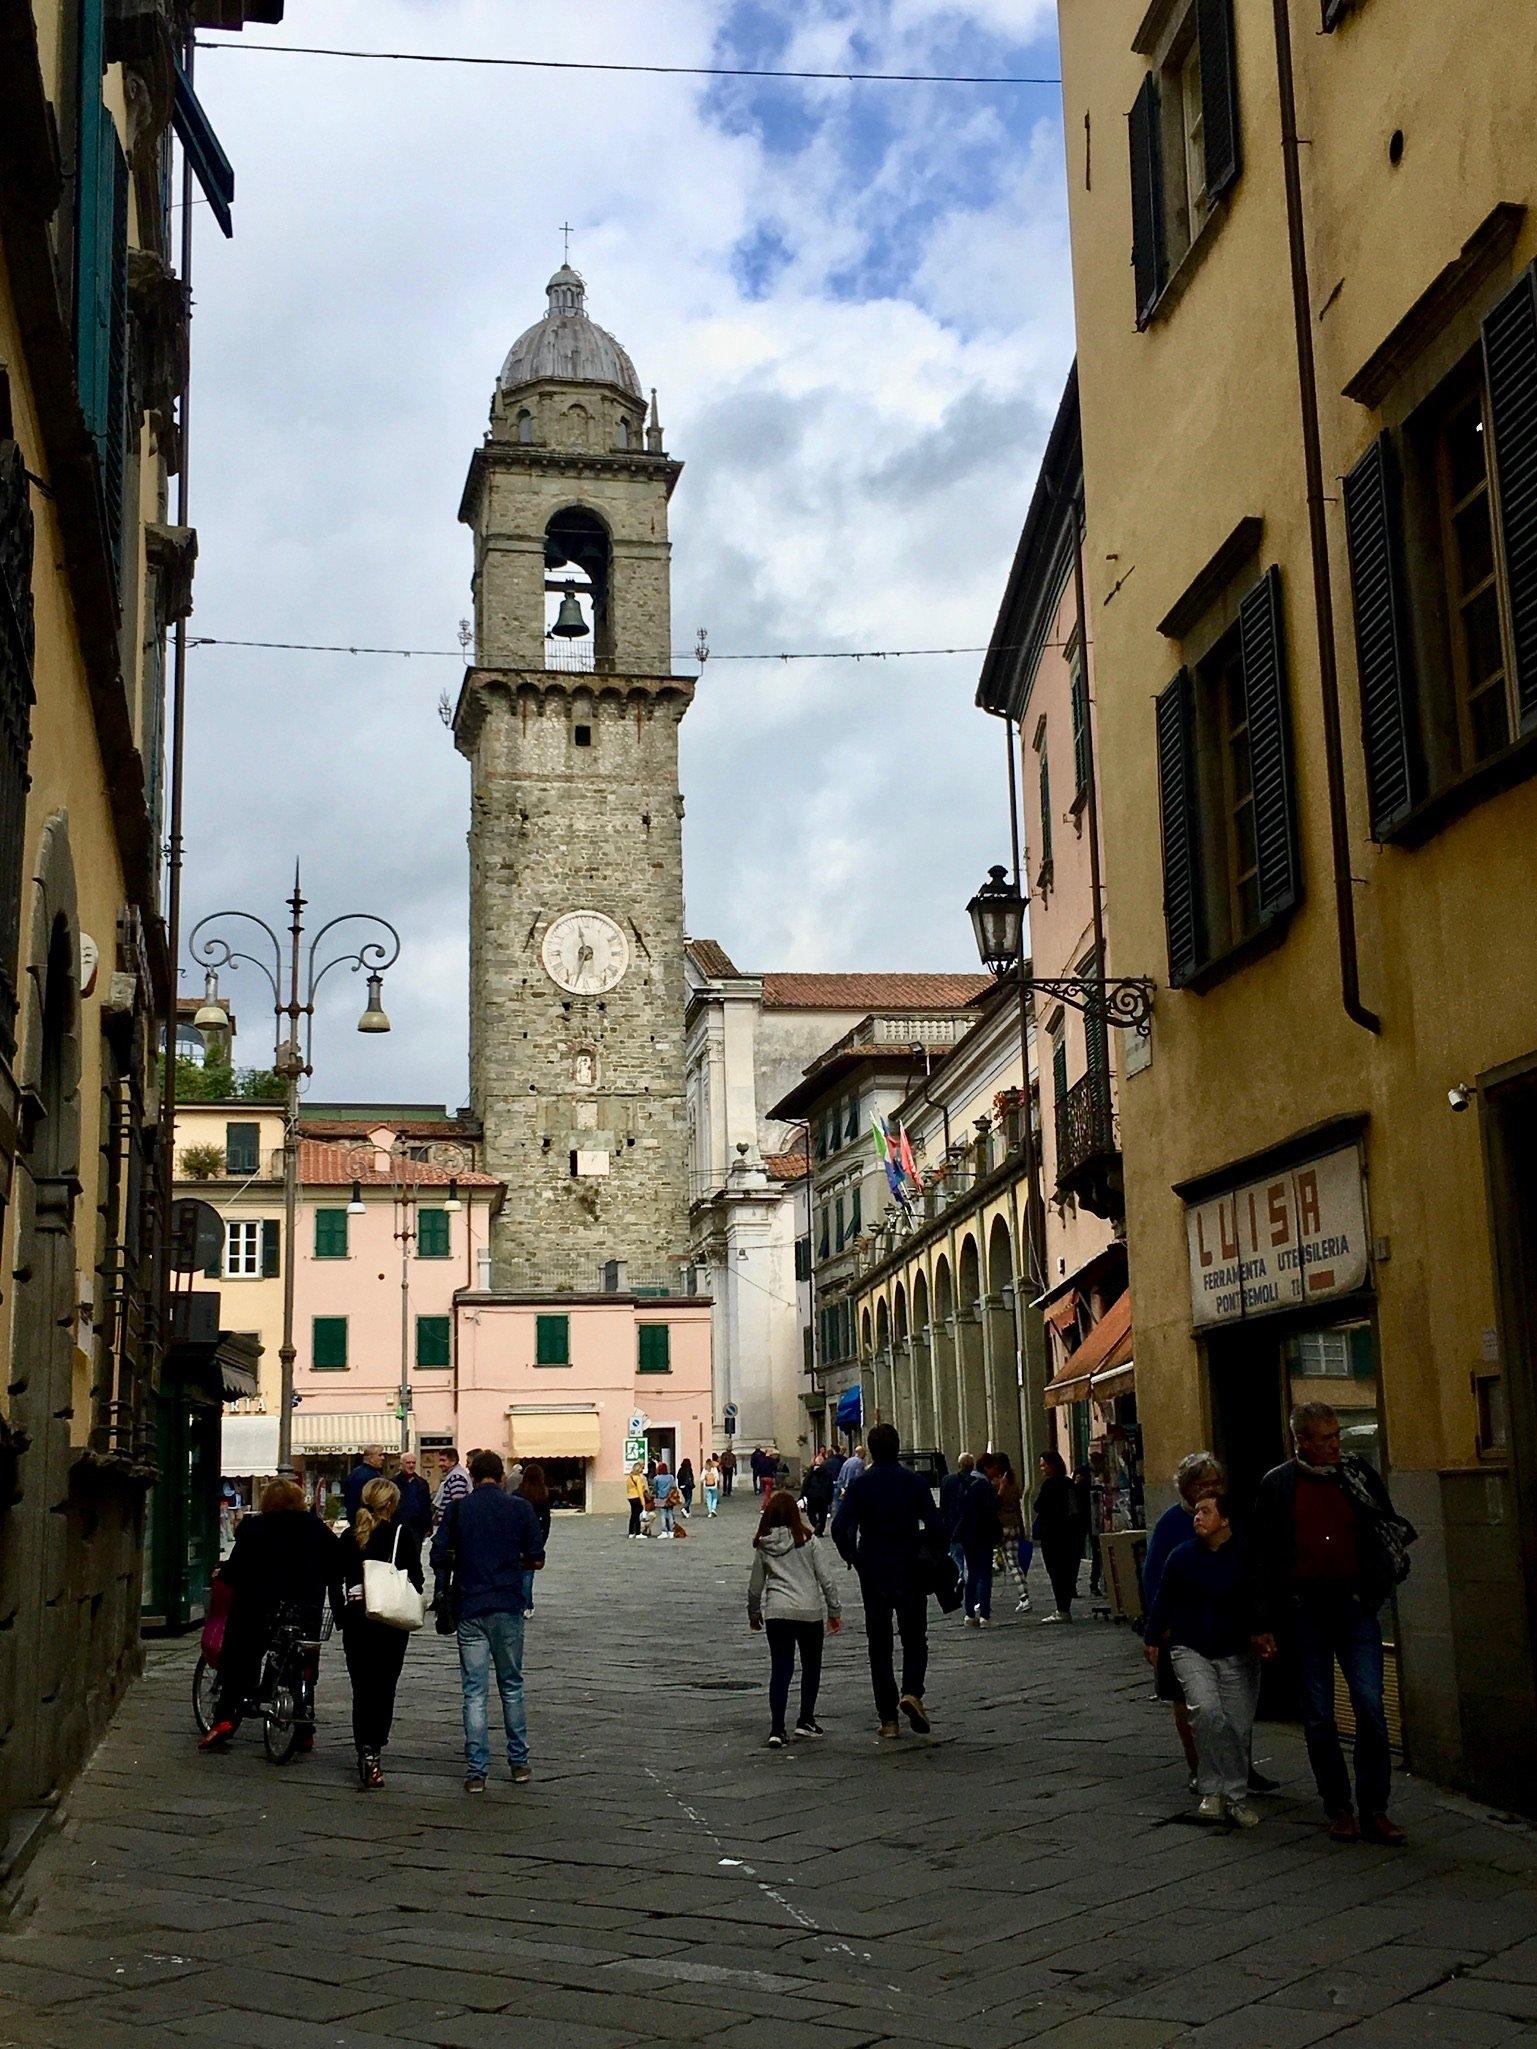 Unterwegs zum Passo della Cisa - Pontremoli